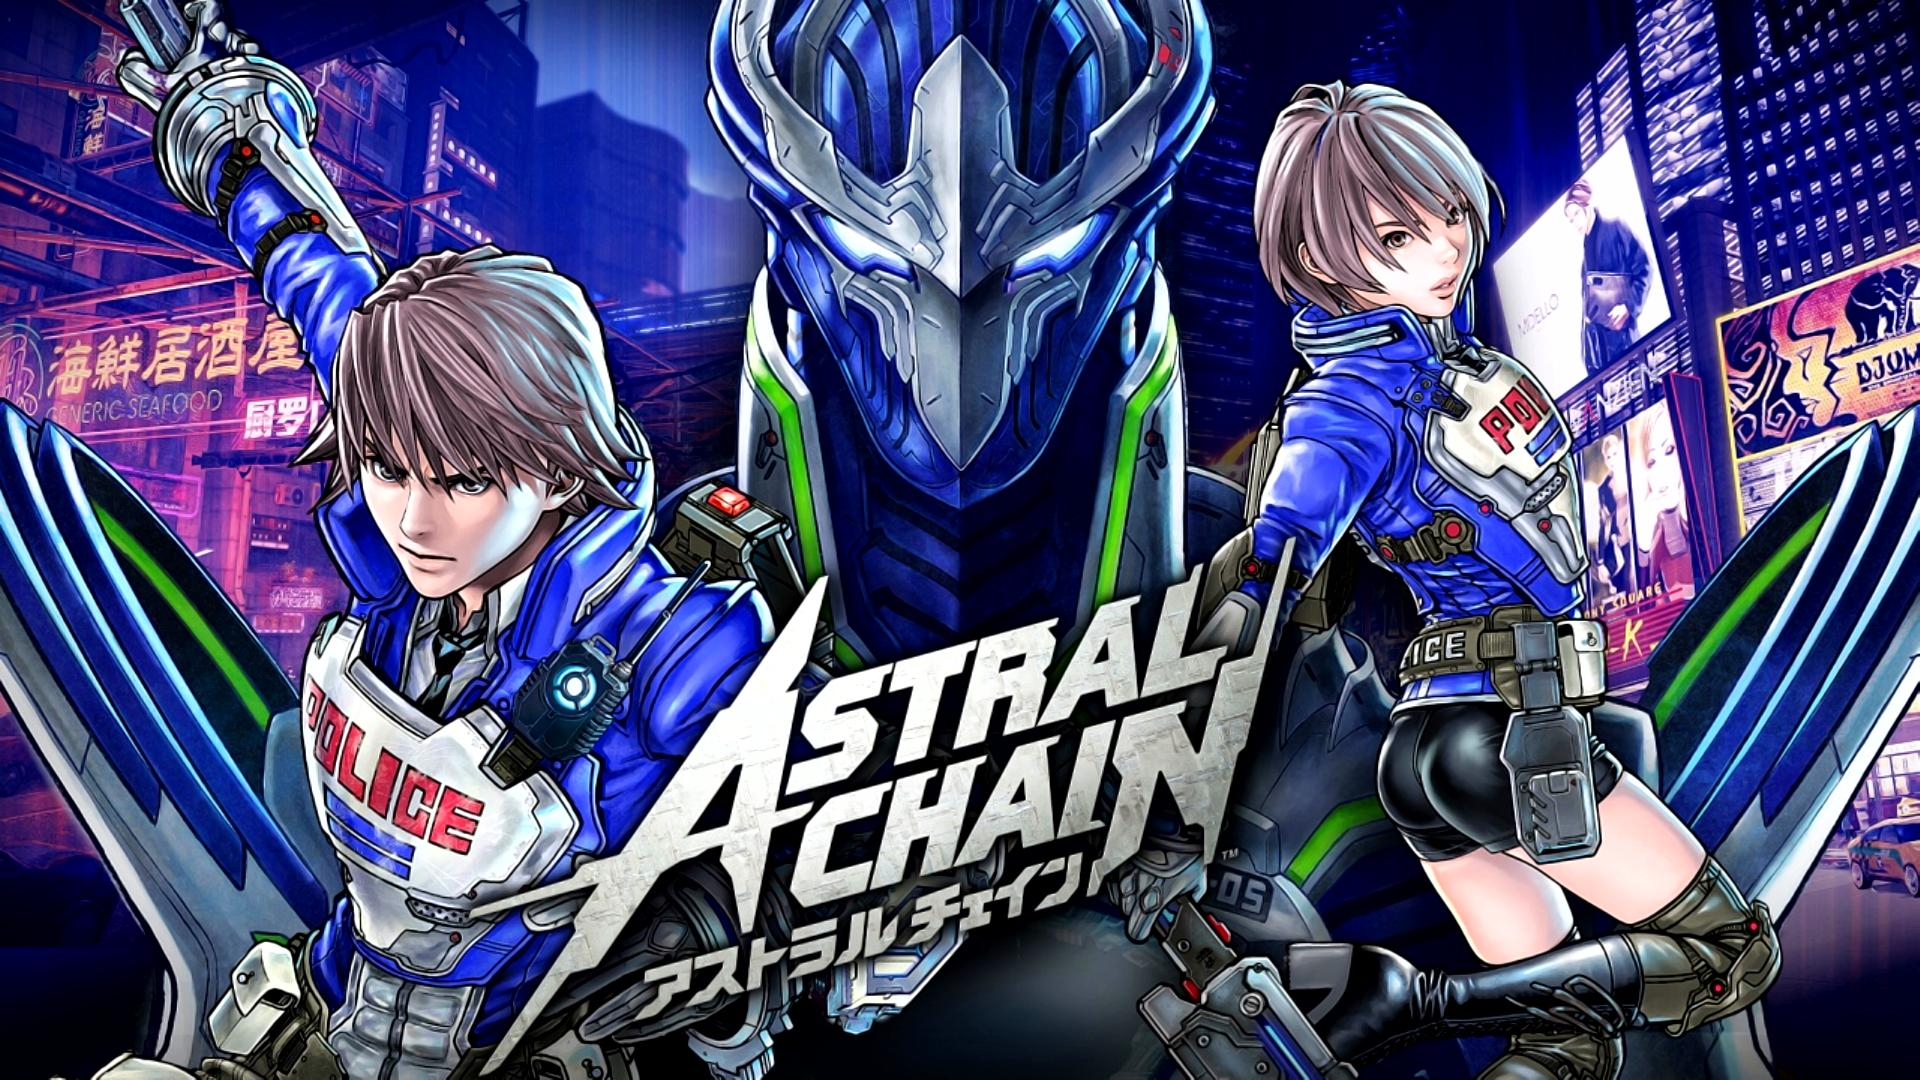 Astral Chain 2019 05 15 19 Artwork